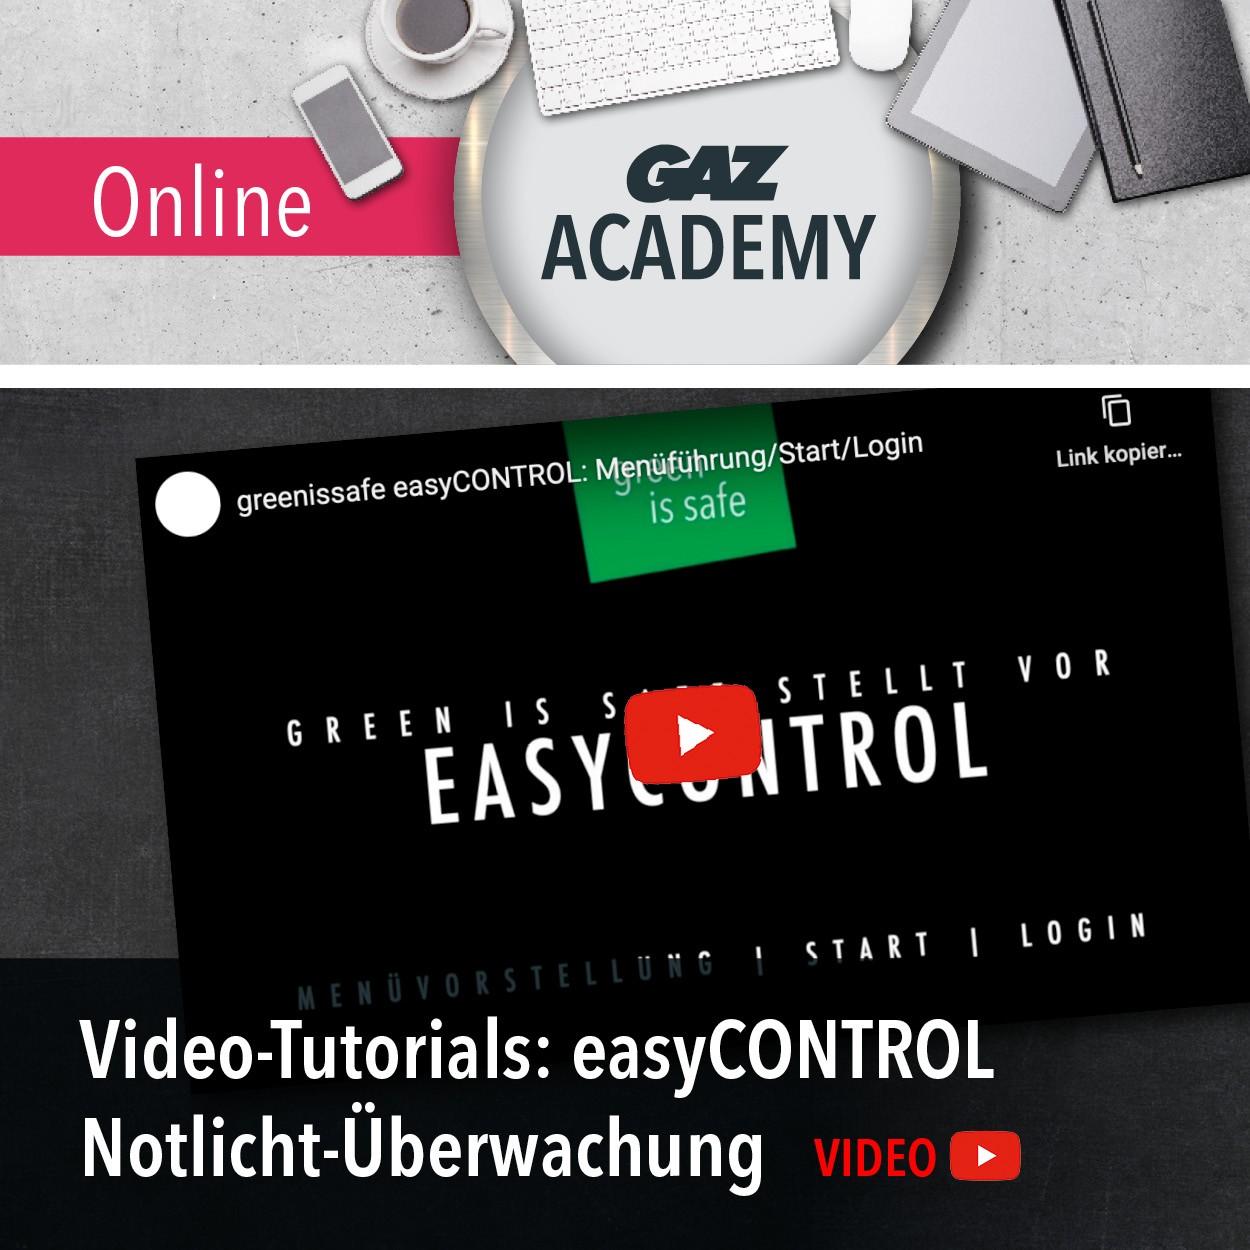 Video_Tutorials_easyCONTROL_GAZ_600x600px